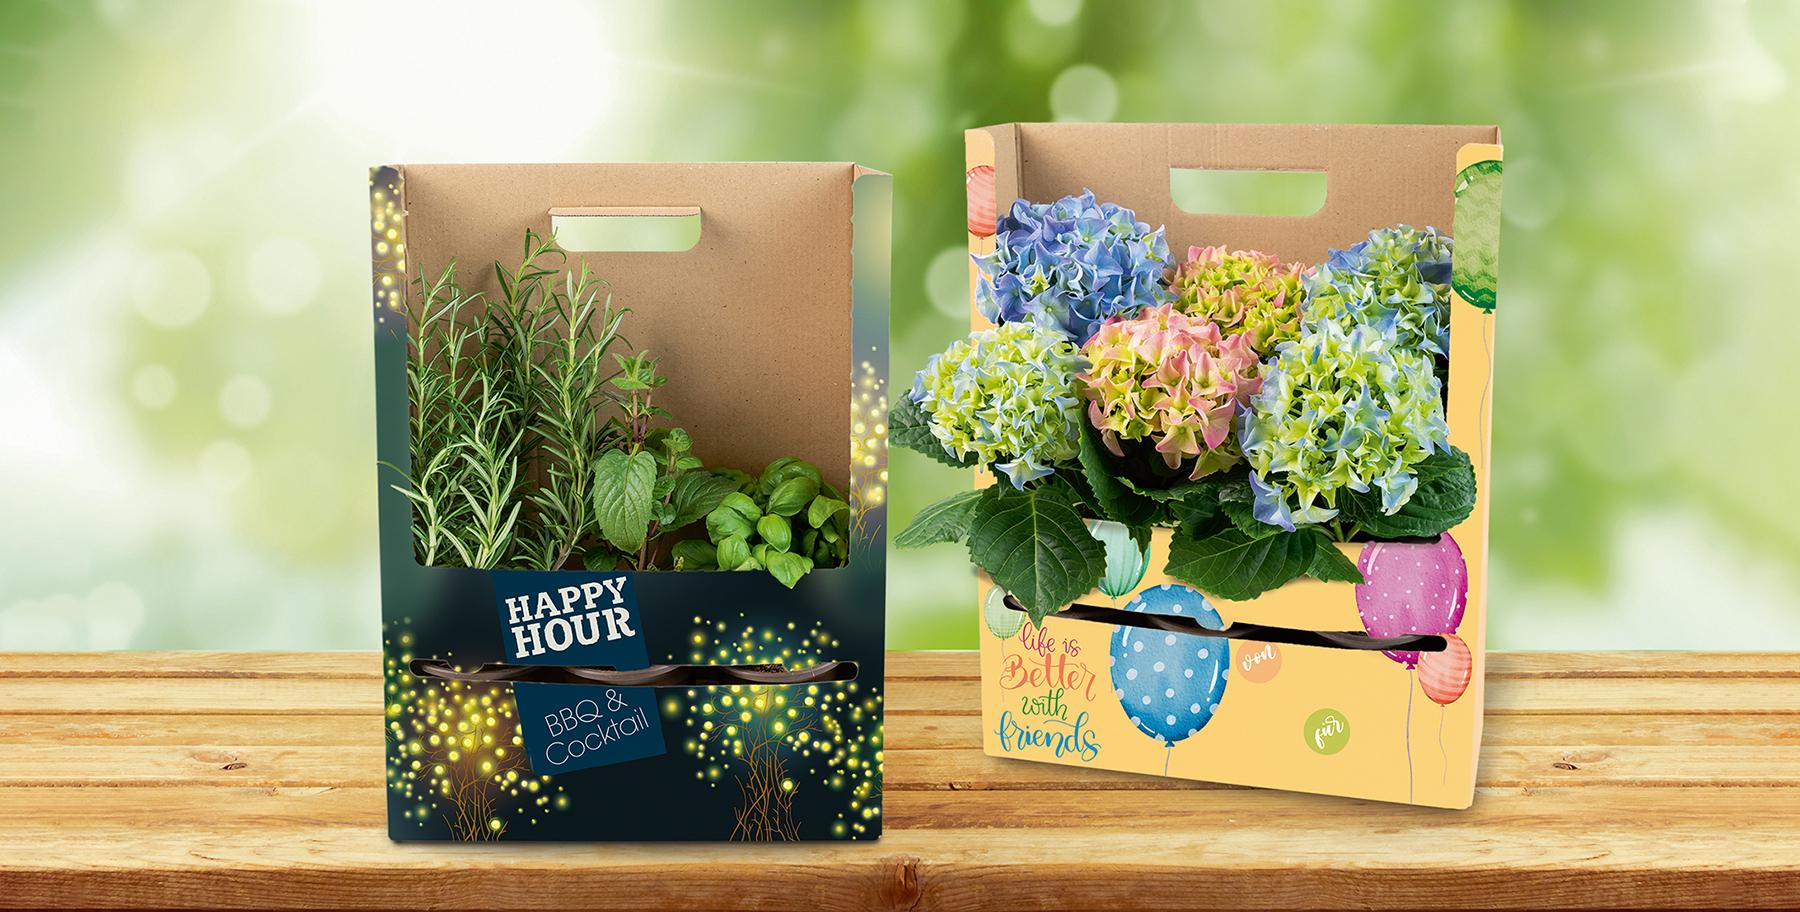 Pflanzenverpackung als Blickfang